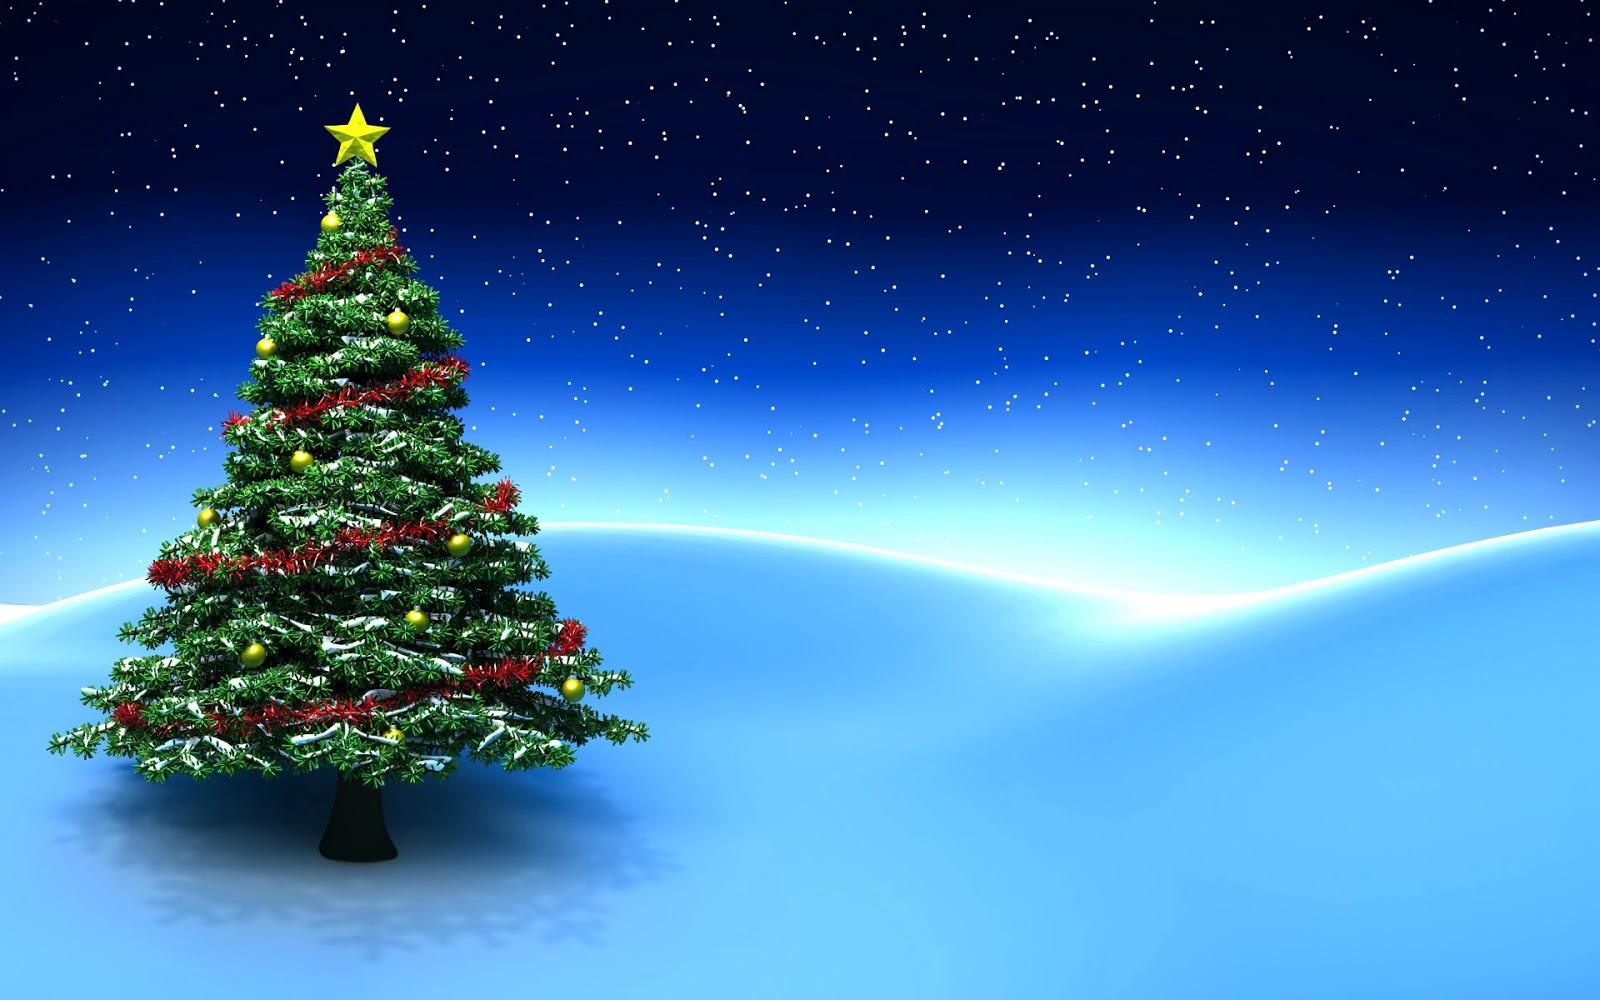 Live Wallpaper Weihnachten.Free Download 3d Winter Weihnachten Wallpaper Mit